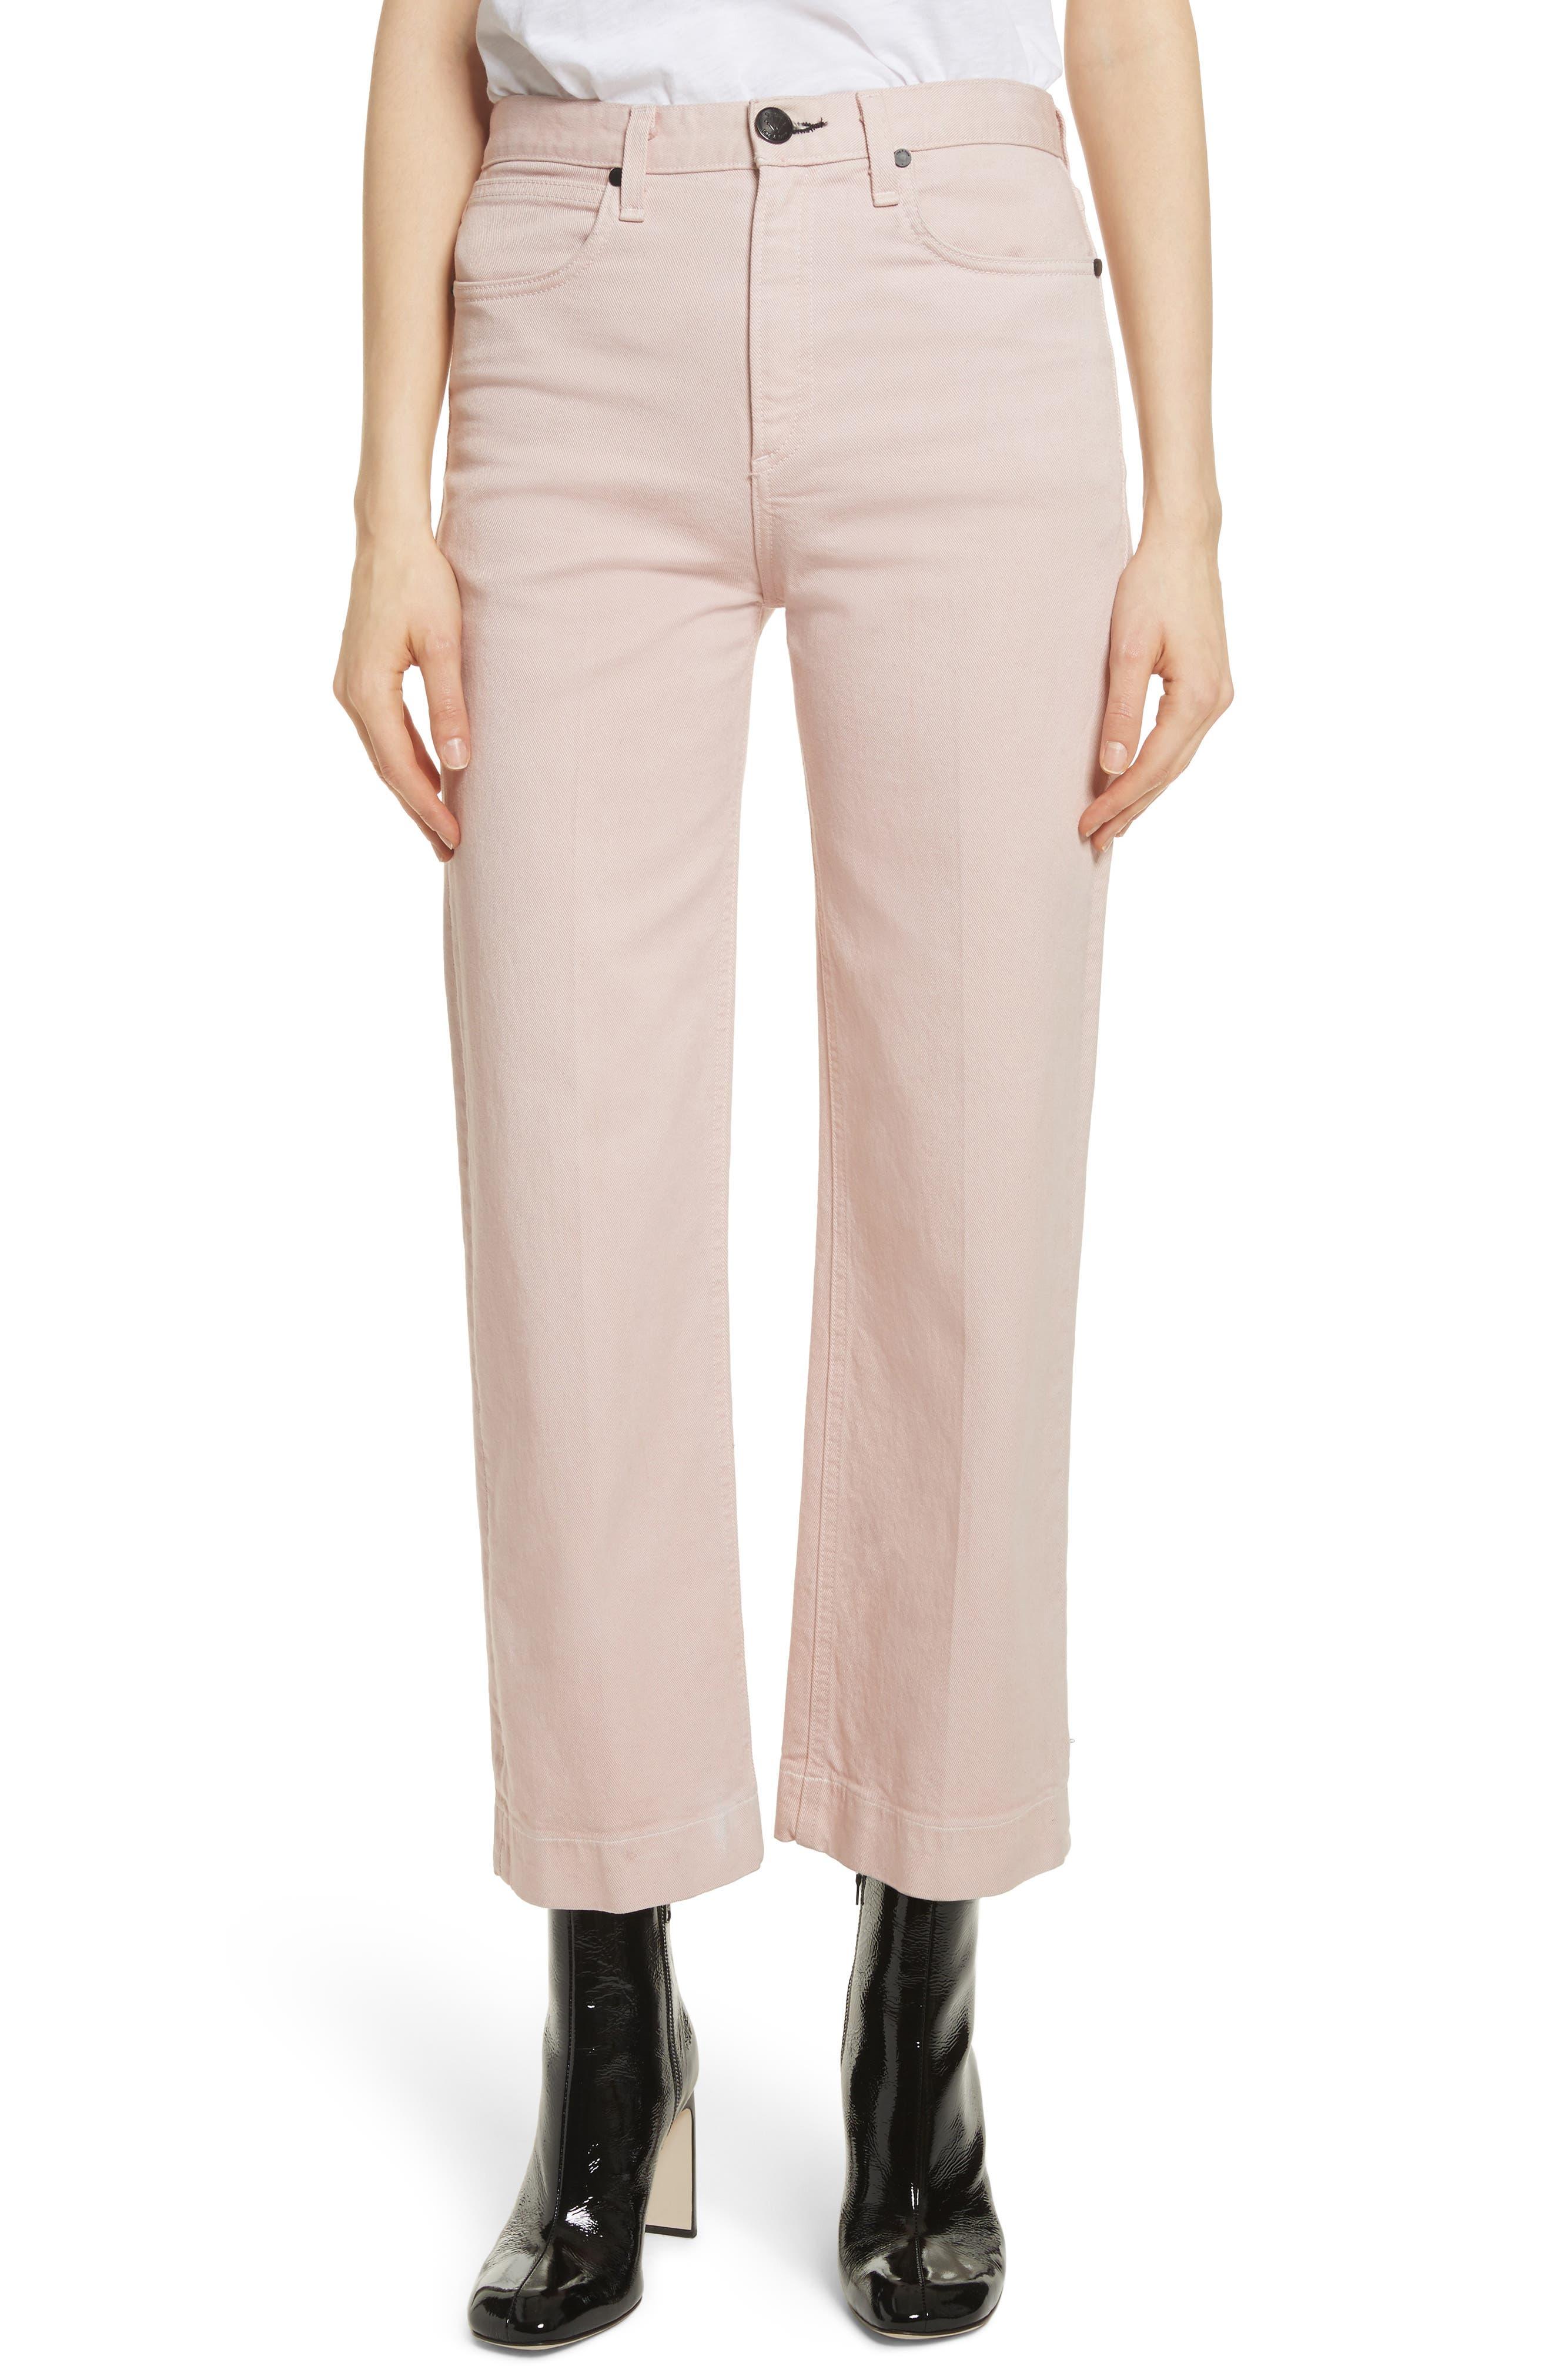 Justine High Waist Trouser Jeans,                             Main thumbnail 1, color,